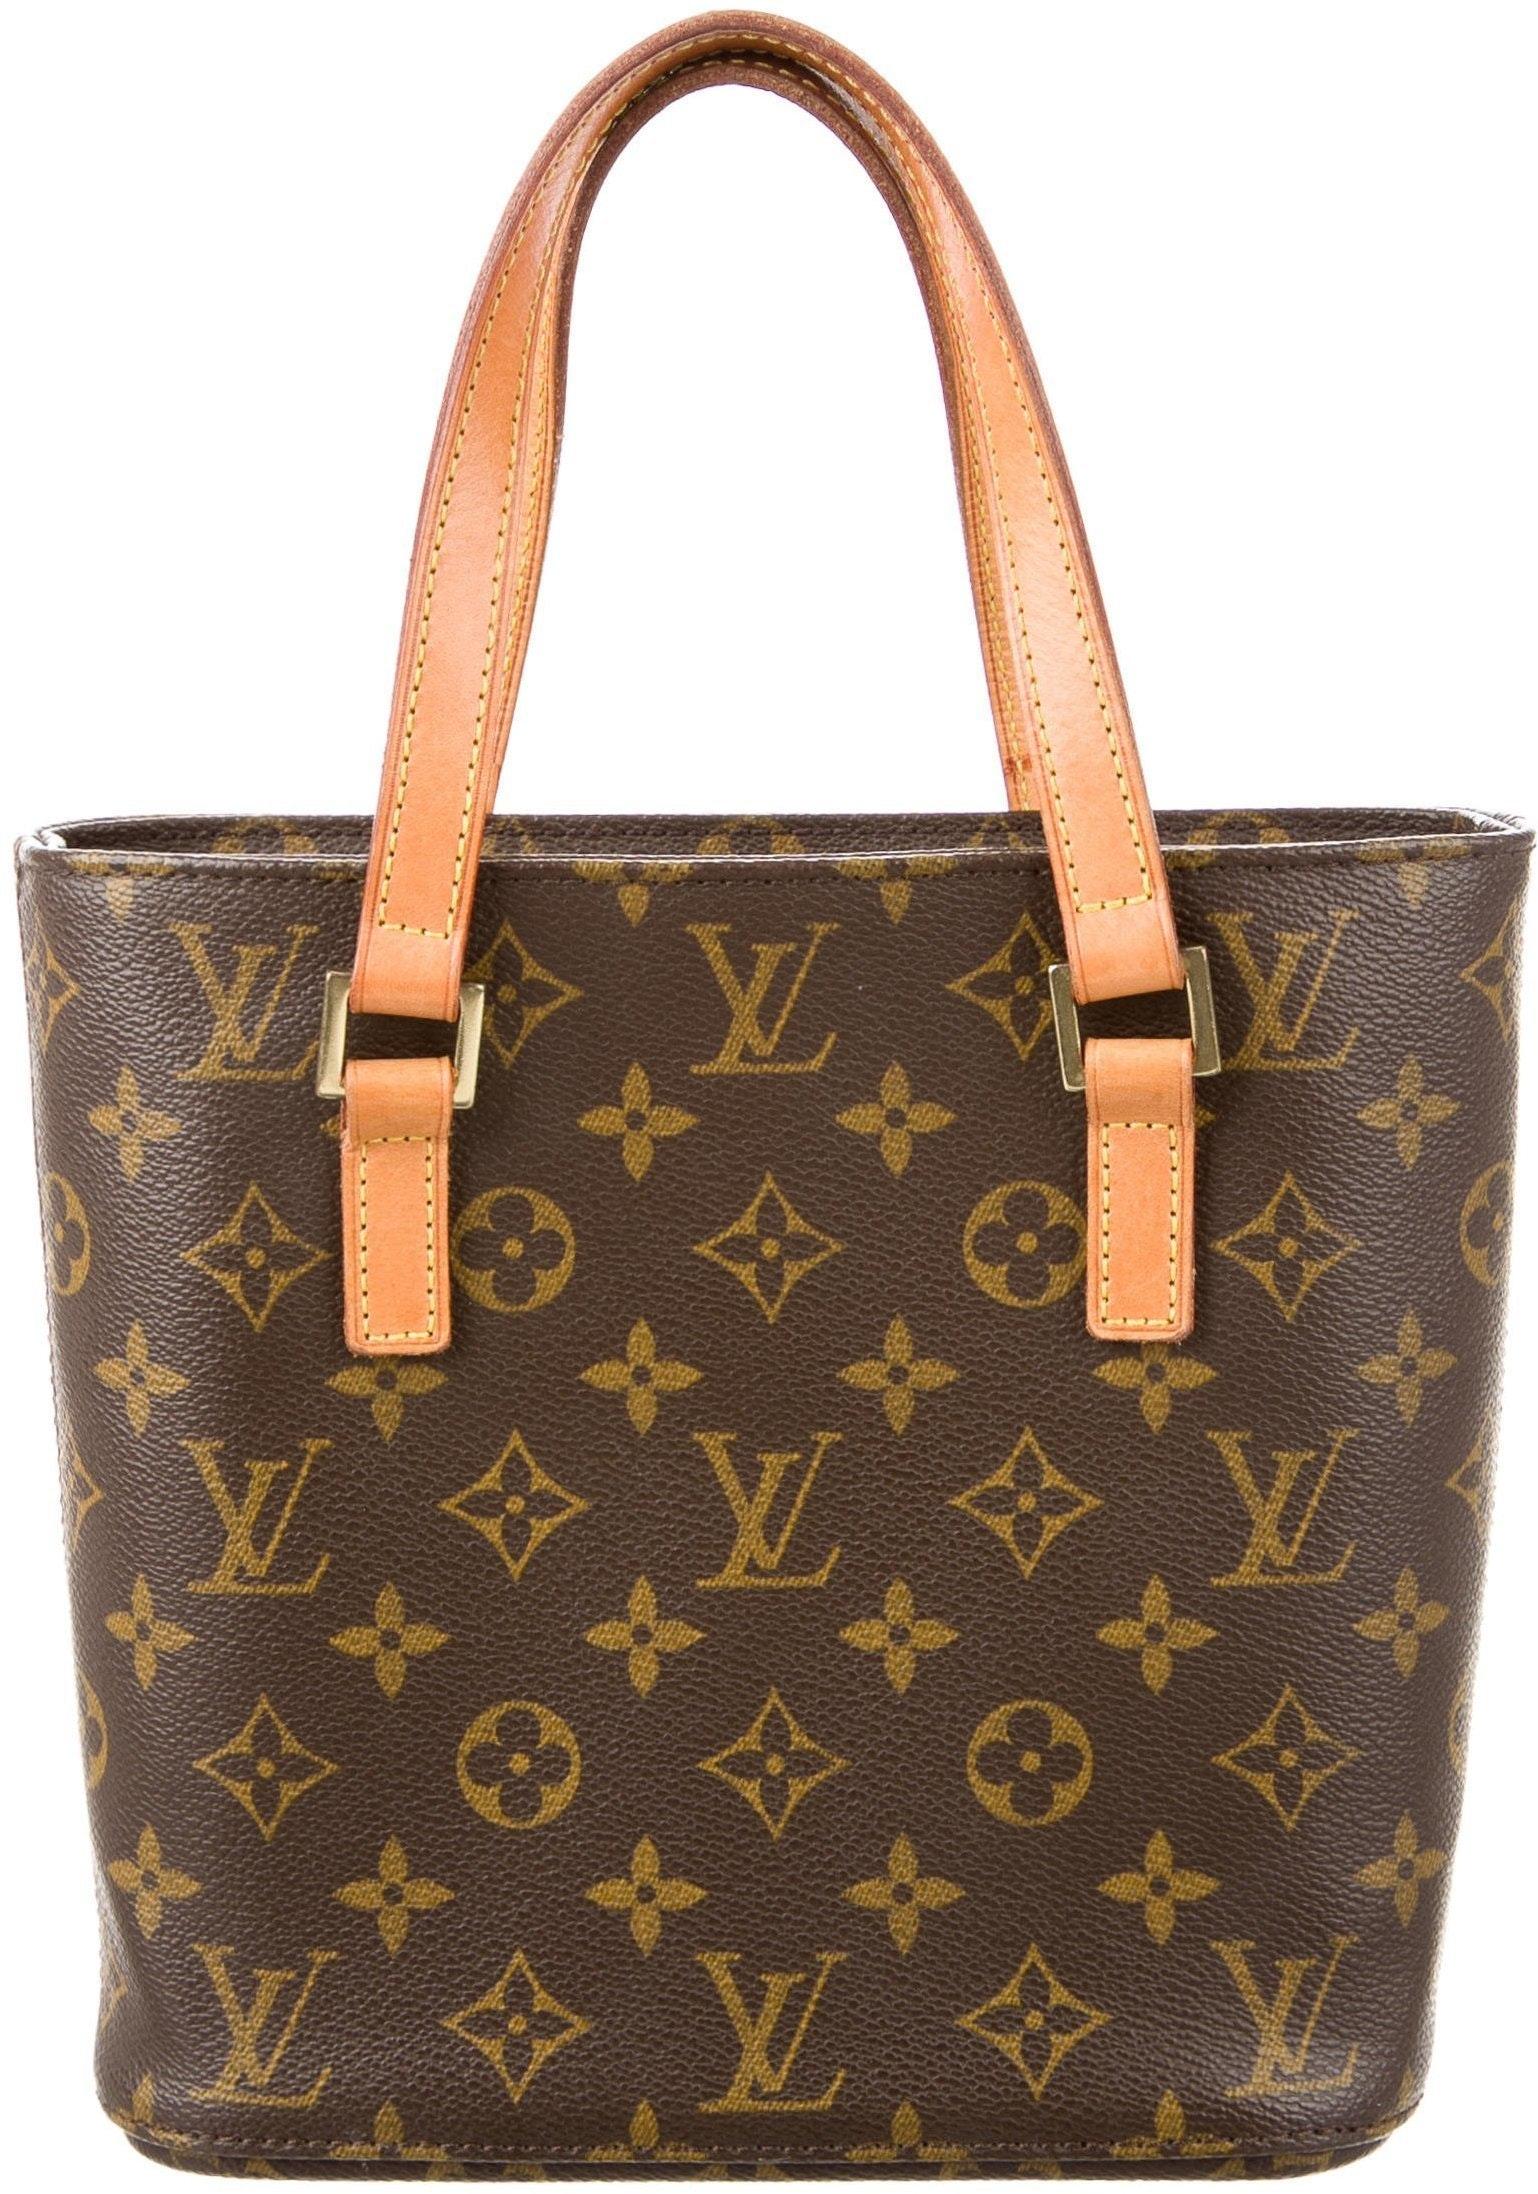 Louis Vuitton Vavin Monogram MM Brown